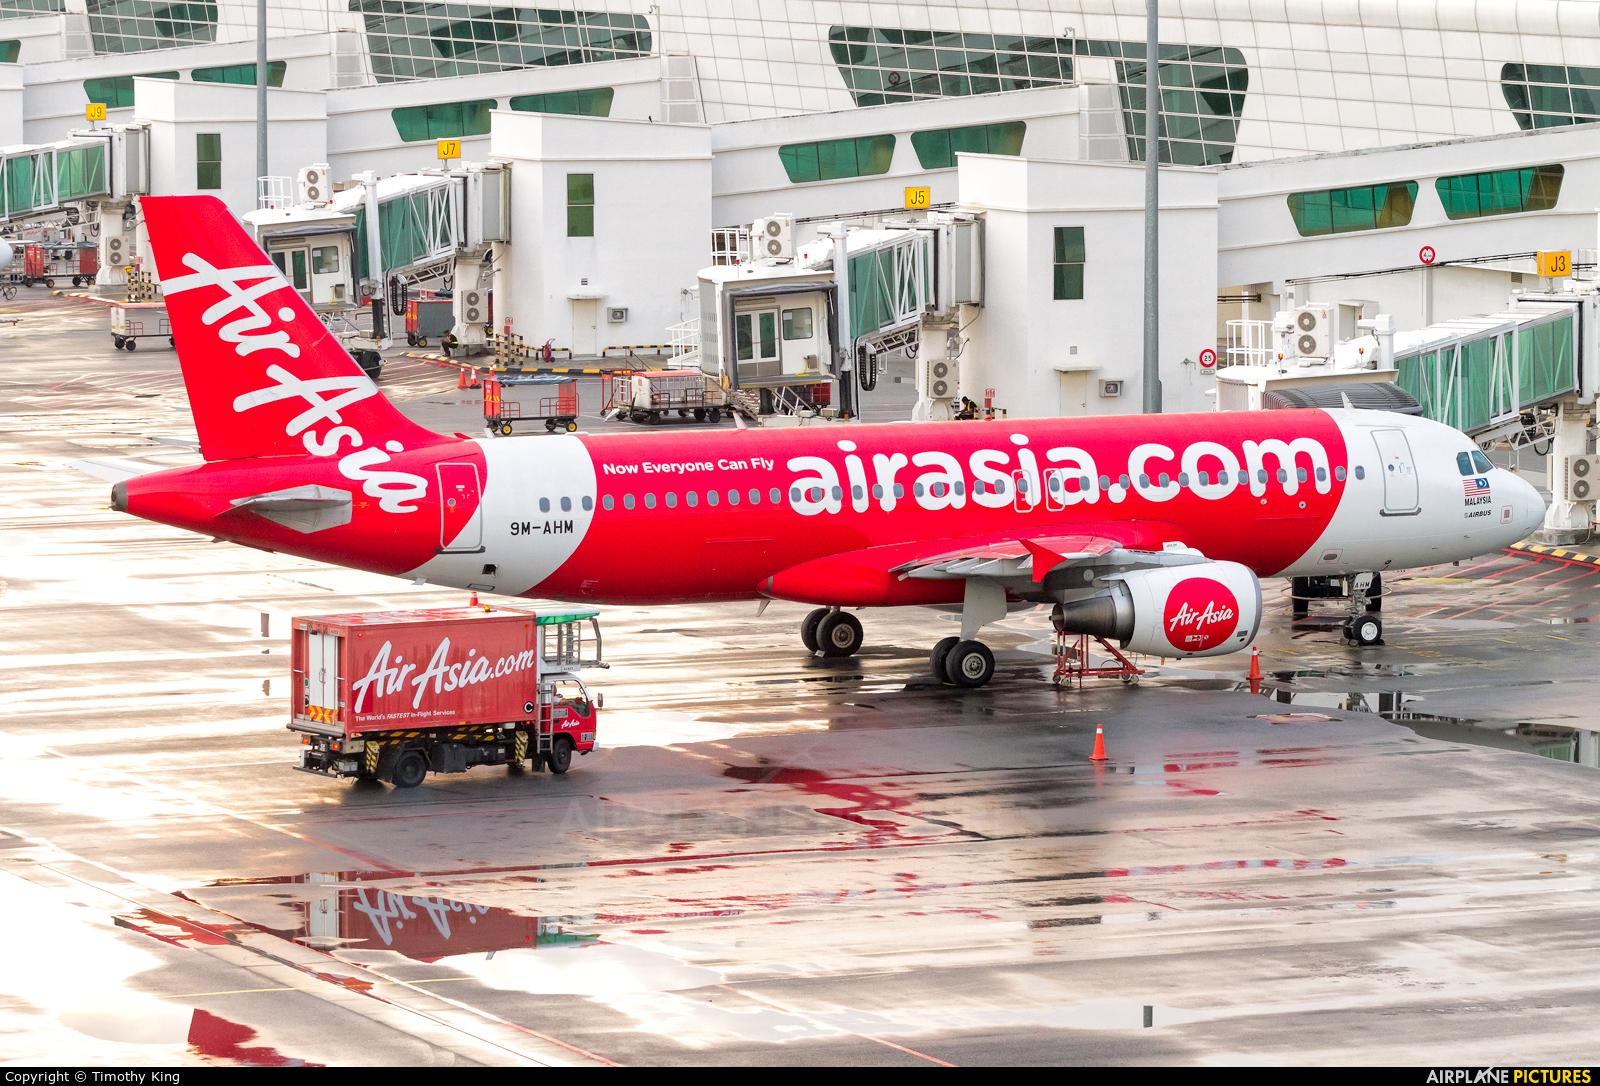 AirAsia (Malaysia) 9M-AHM aircraft at Kuala Lumpur Intl